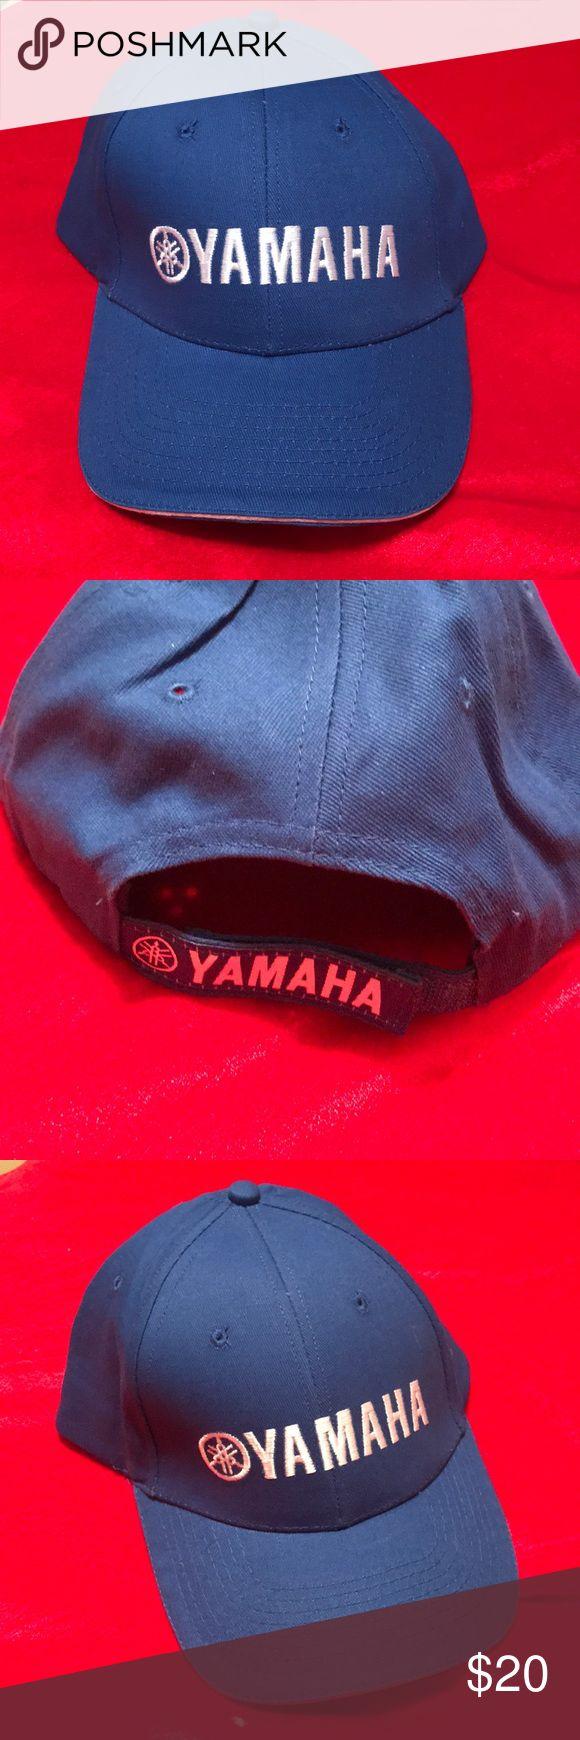 Yamaha hat Blue Yamaha hat brand new yamaha Accessories Hats